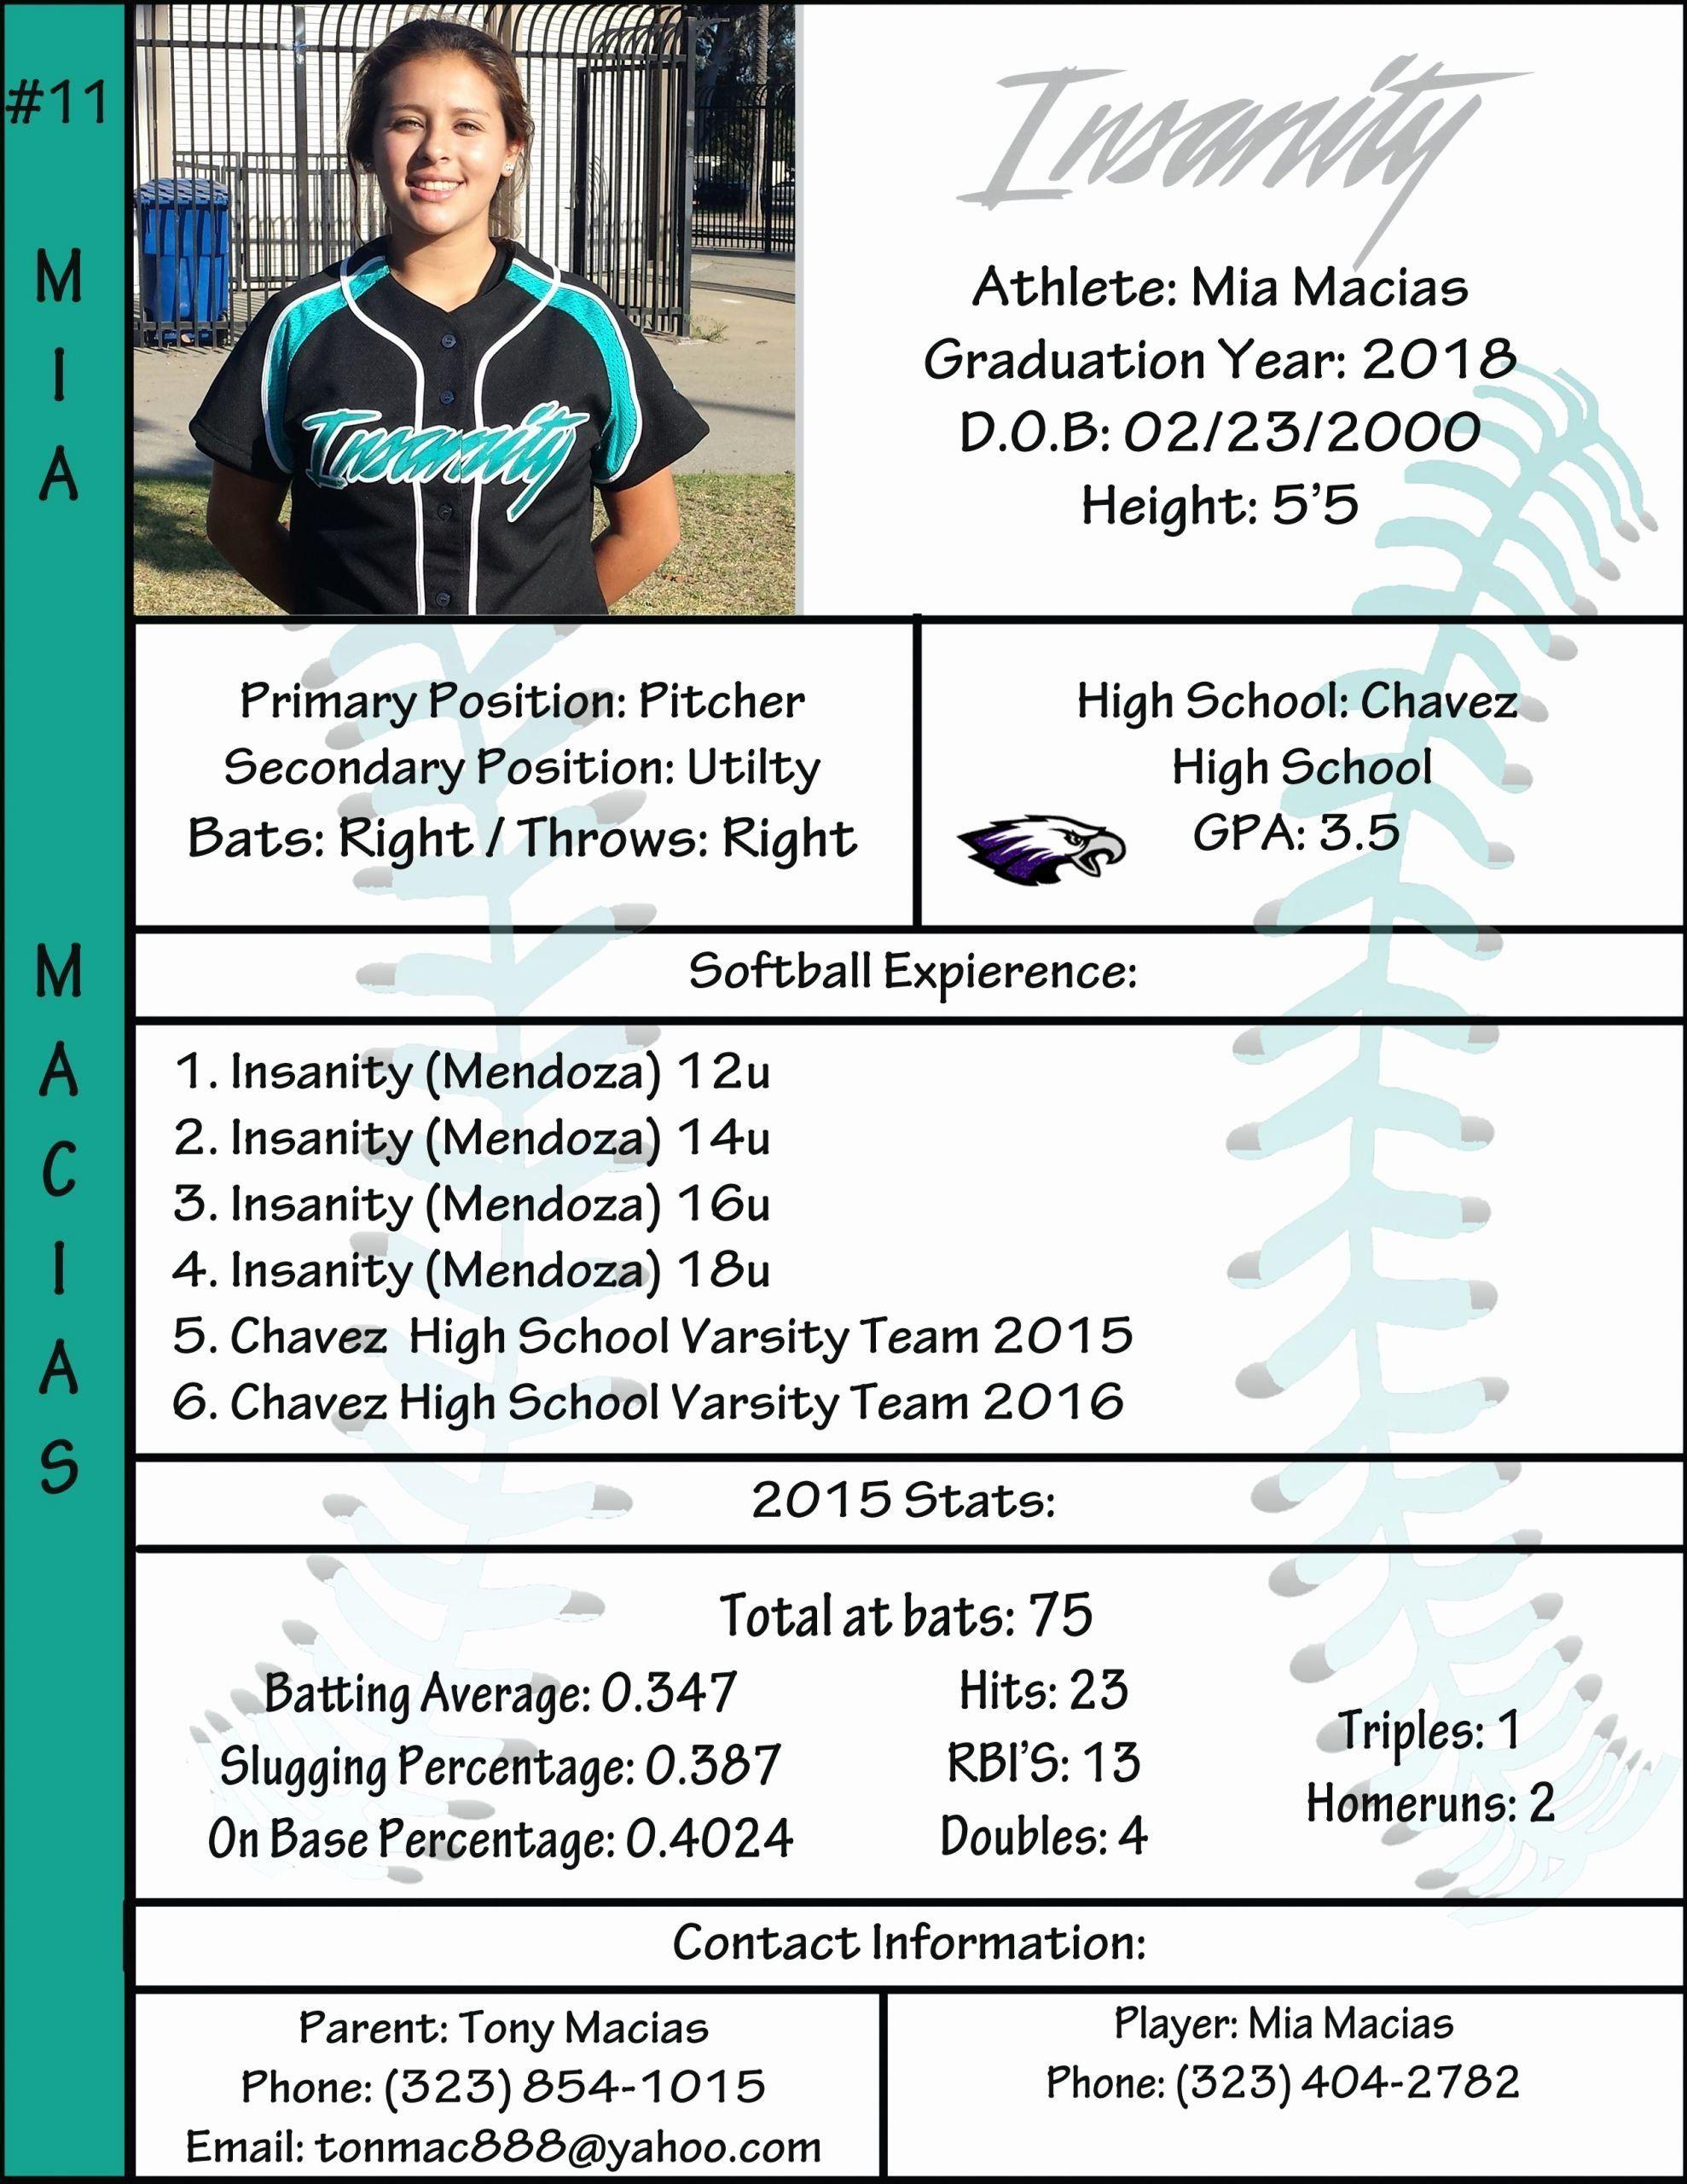 Rn Nurse Resume Template In 2021 Softball Players Nursing Resume Template Softball